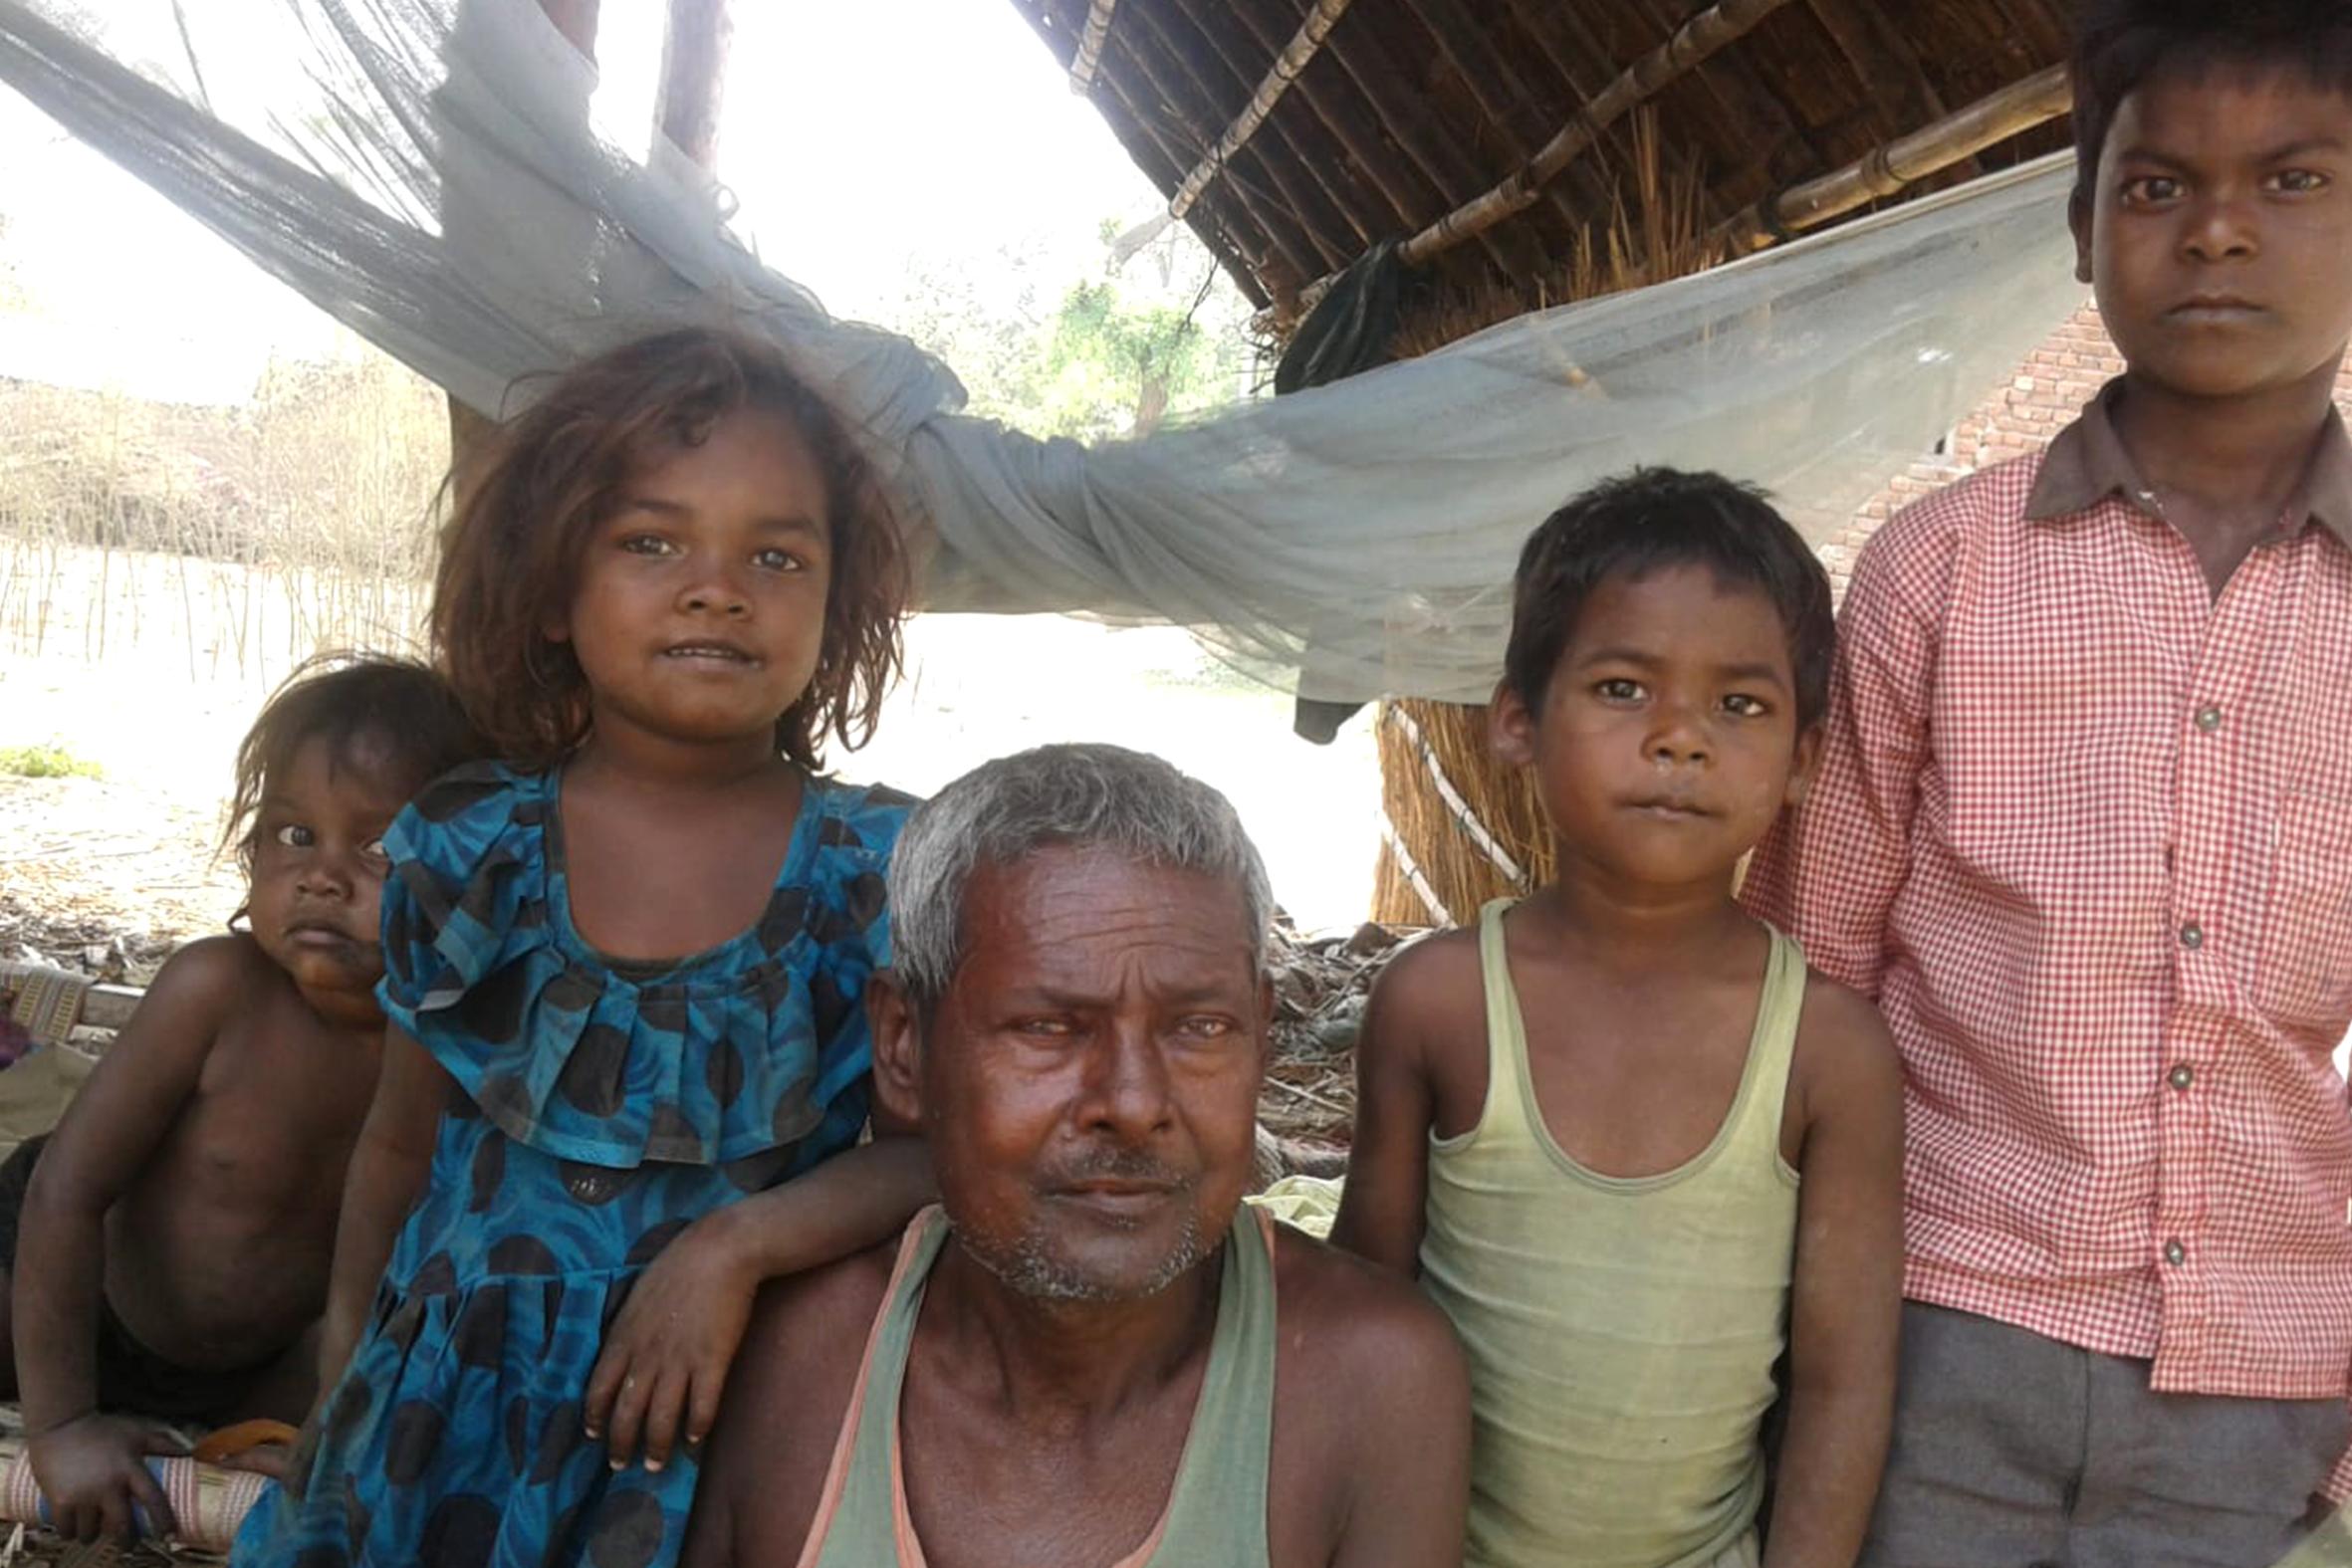 A treated kala-azar man, posing with grandchildren.